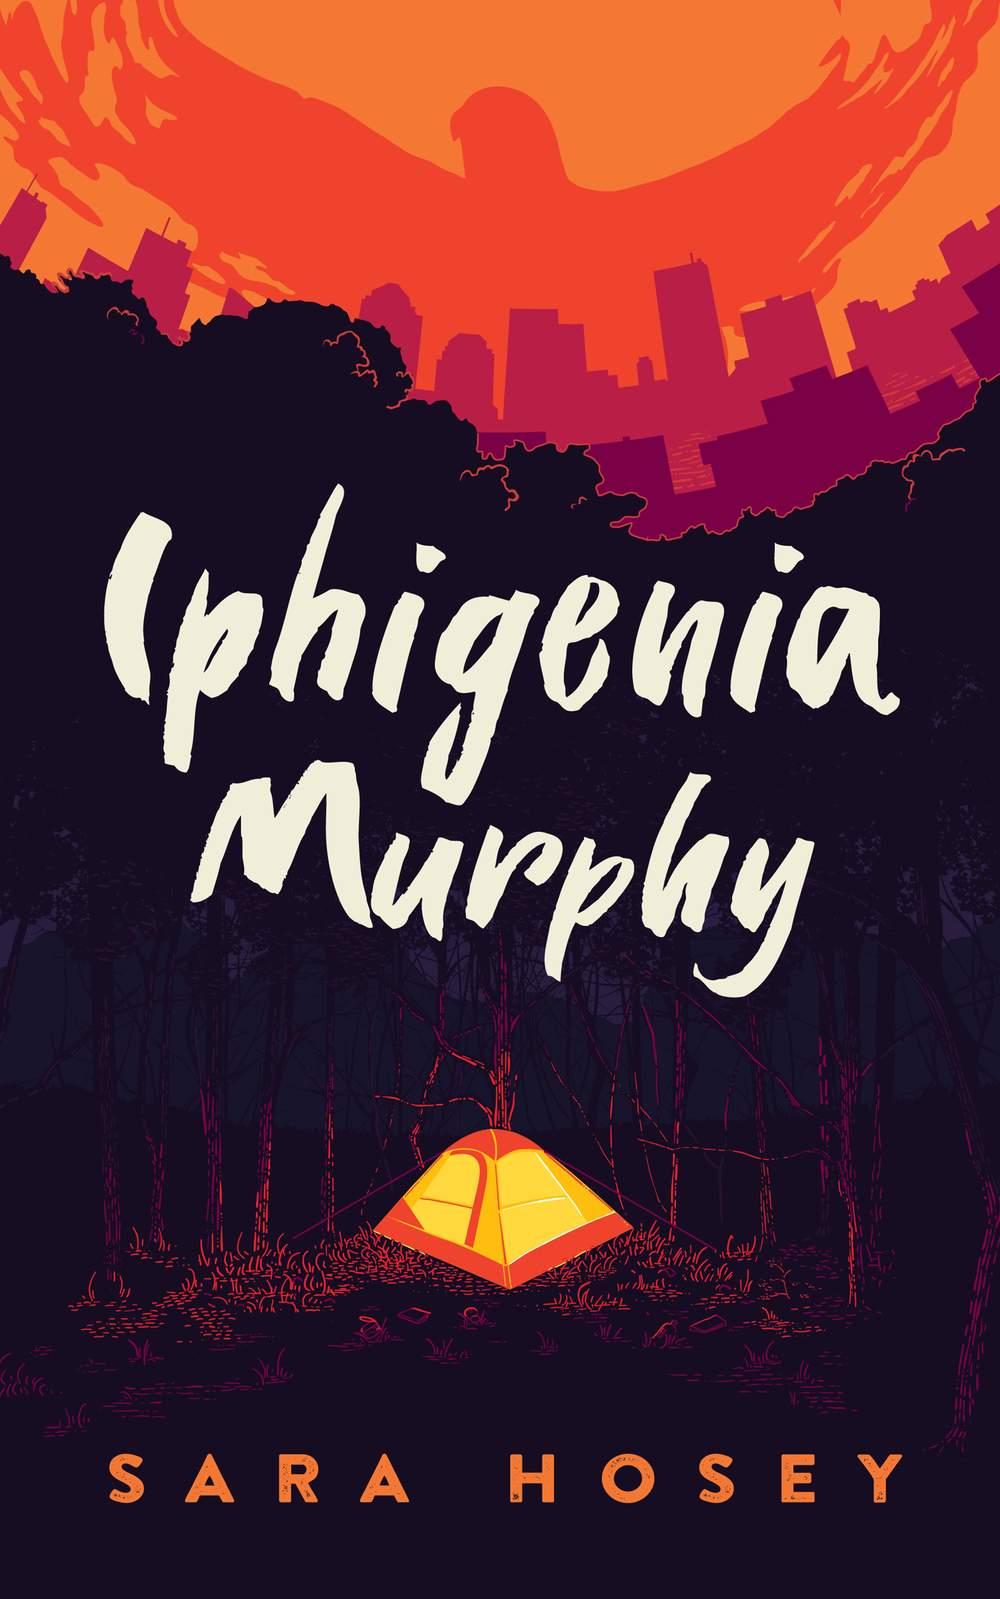 Iphigenia Murphy book cover